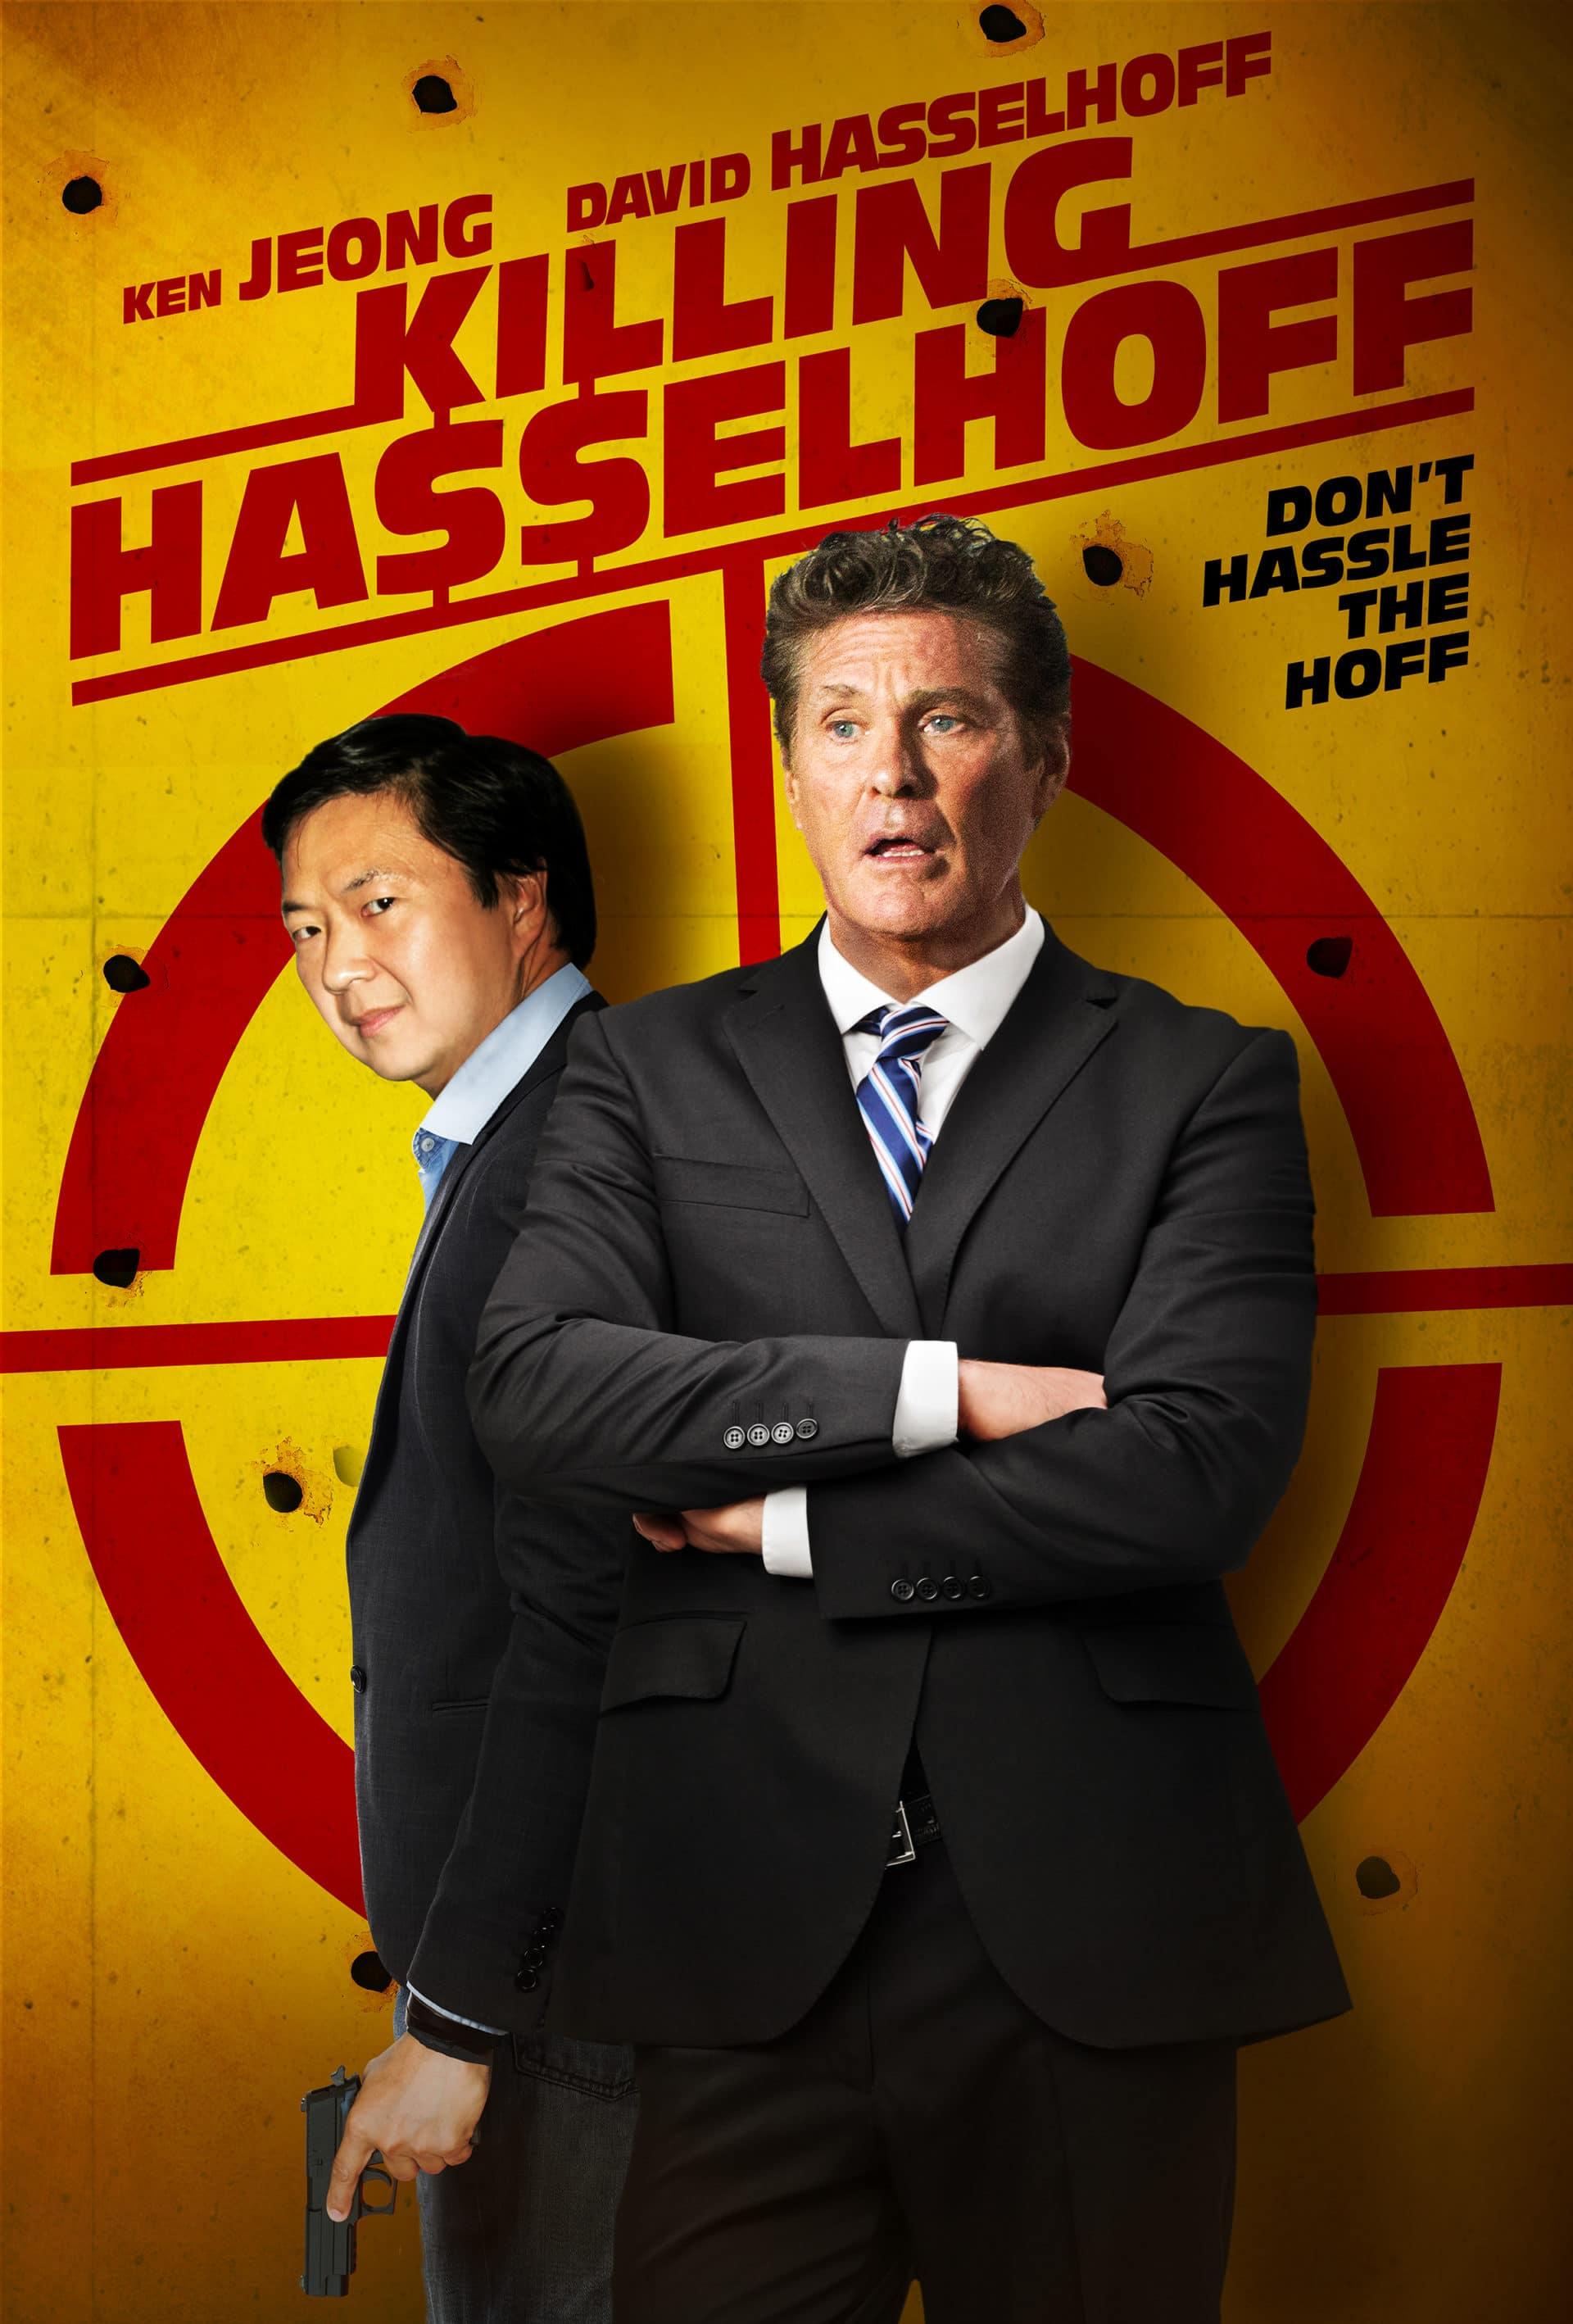 Objetivo Hasselhoff